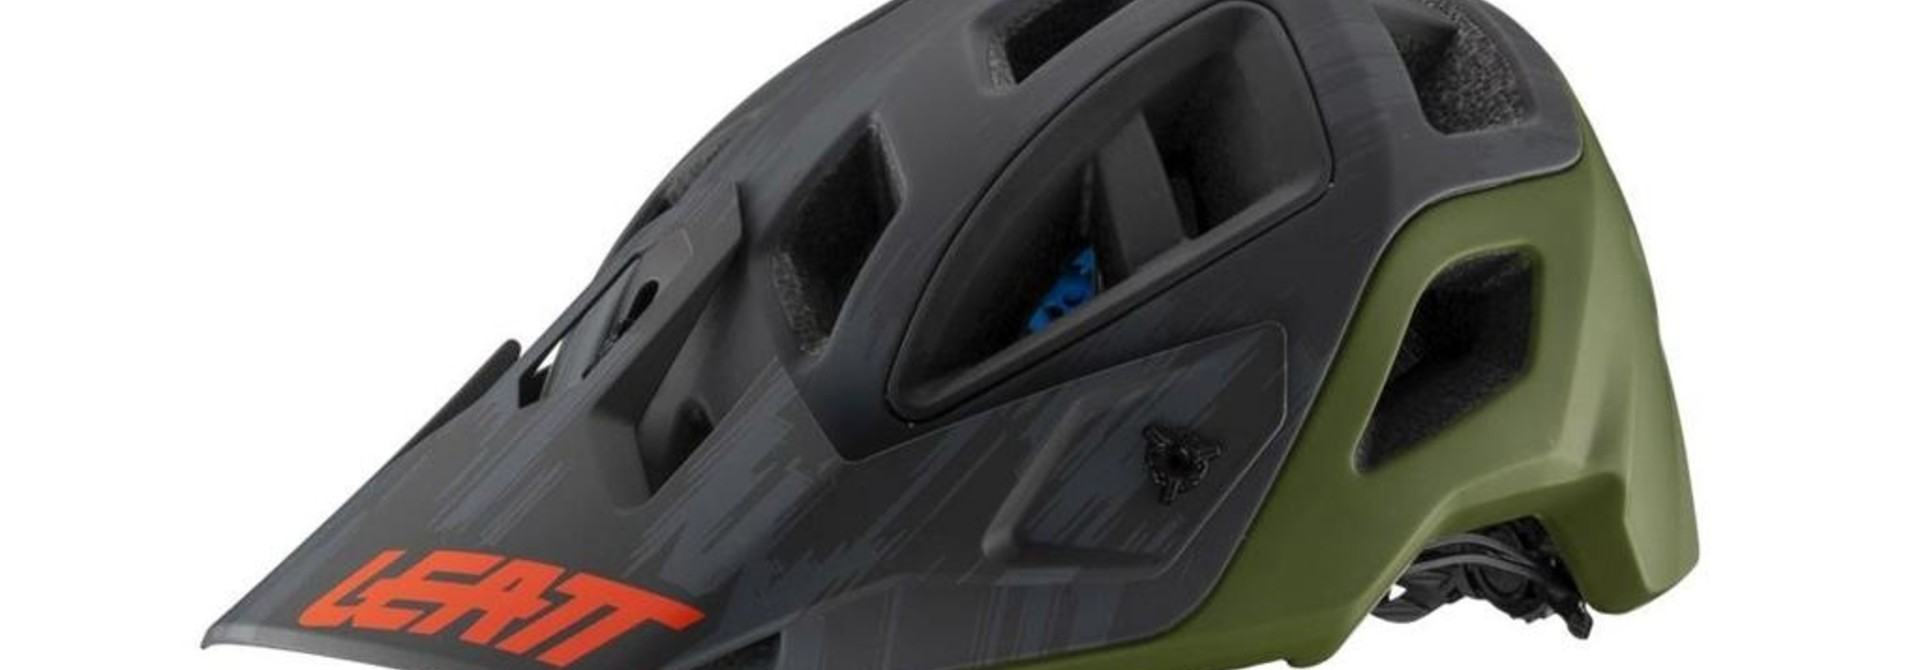 Leatt  Helmet DBX 3.0 Forest Green Large